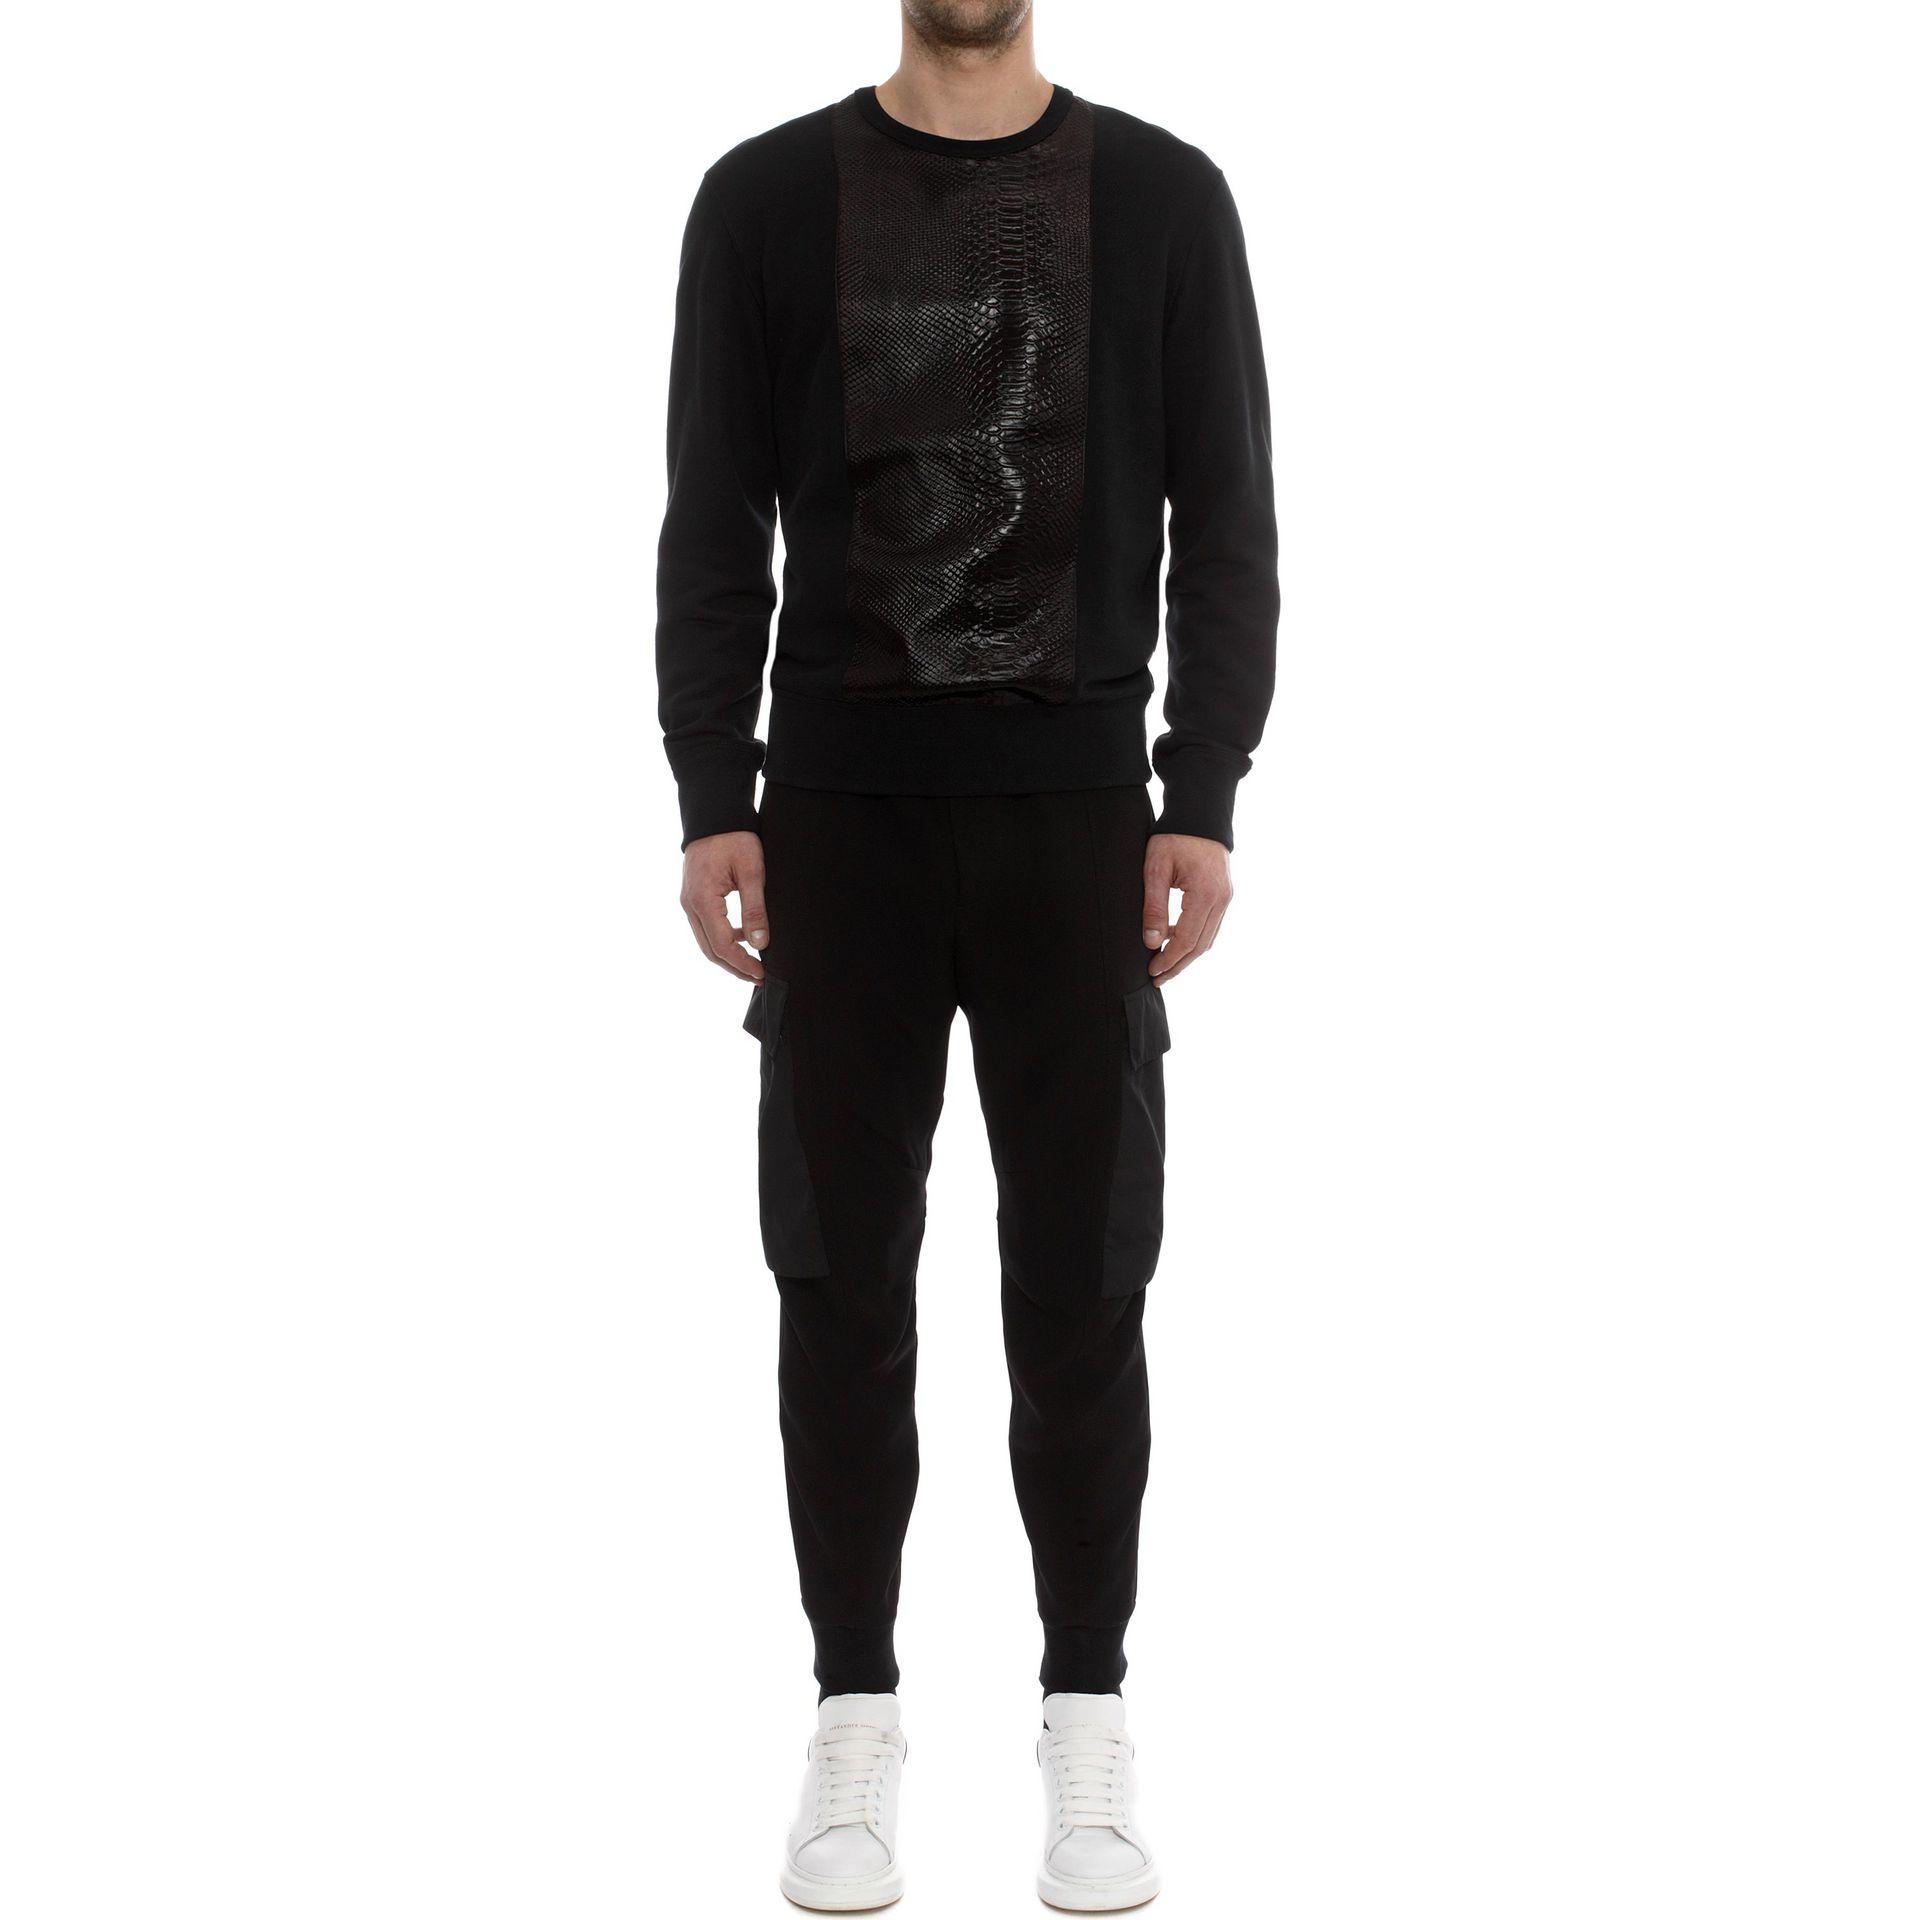 alexander mcqueen paneled sweatshirt in black lyst. Black Bedroom Furniture Sets. Home Design Ideas